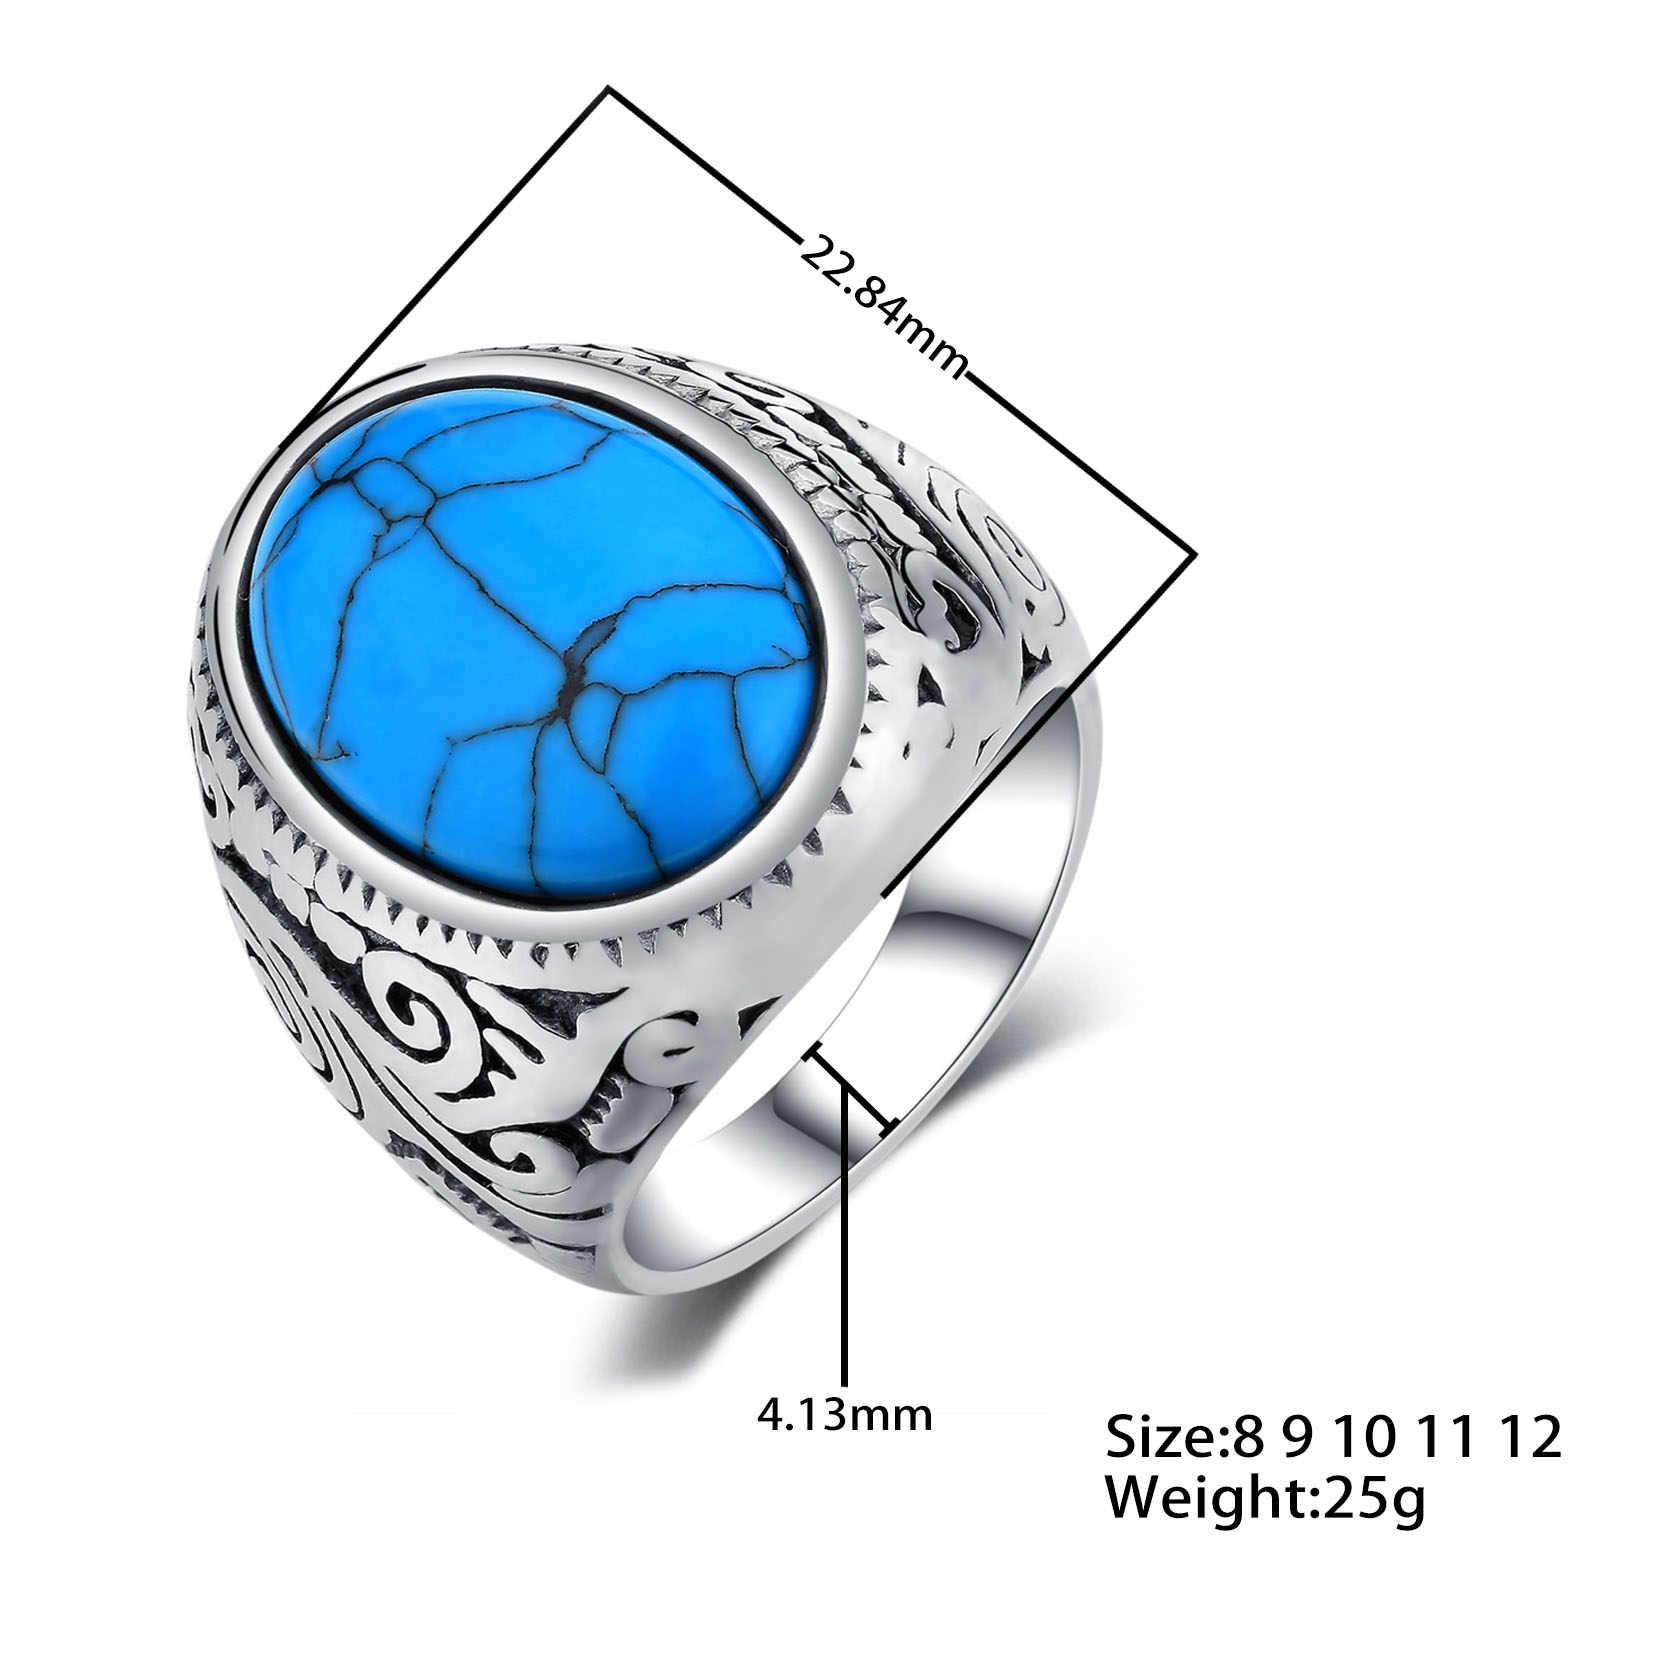 Jiayiqi Vintage แหวนผู้ชายสีฟ้าหินขัดสแตนเลสผู้ชายเครื่องประดับ Silver Charm แหวนสำหรับชายคุณภาพสูง